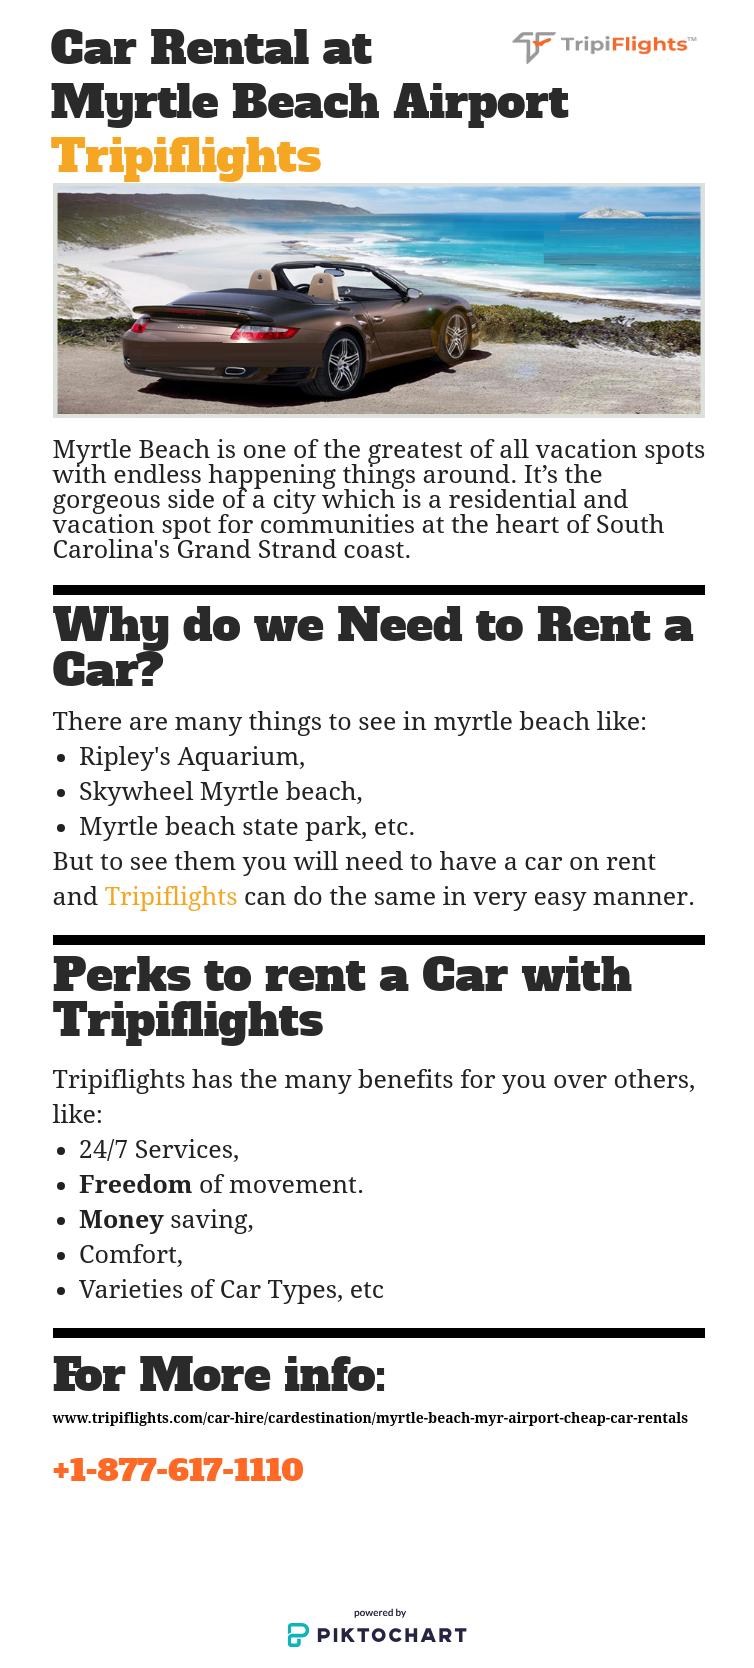 Car Rental At Myrtle Beach The Best Way To Travel Tripiflights Car Rental Car Rental Deals Airport Car Rental